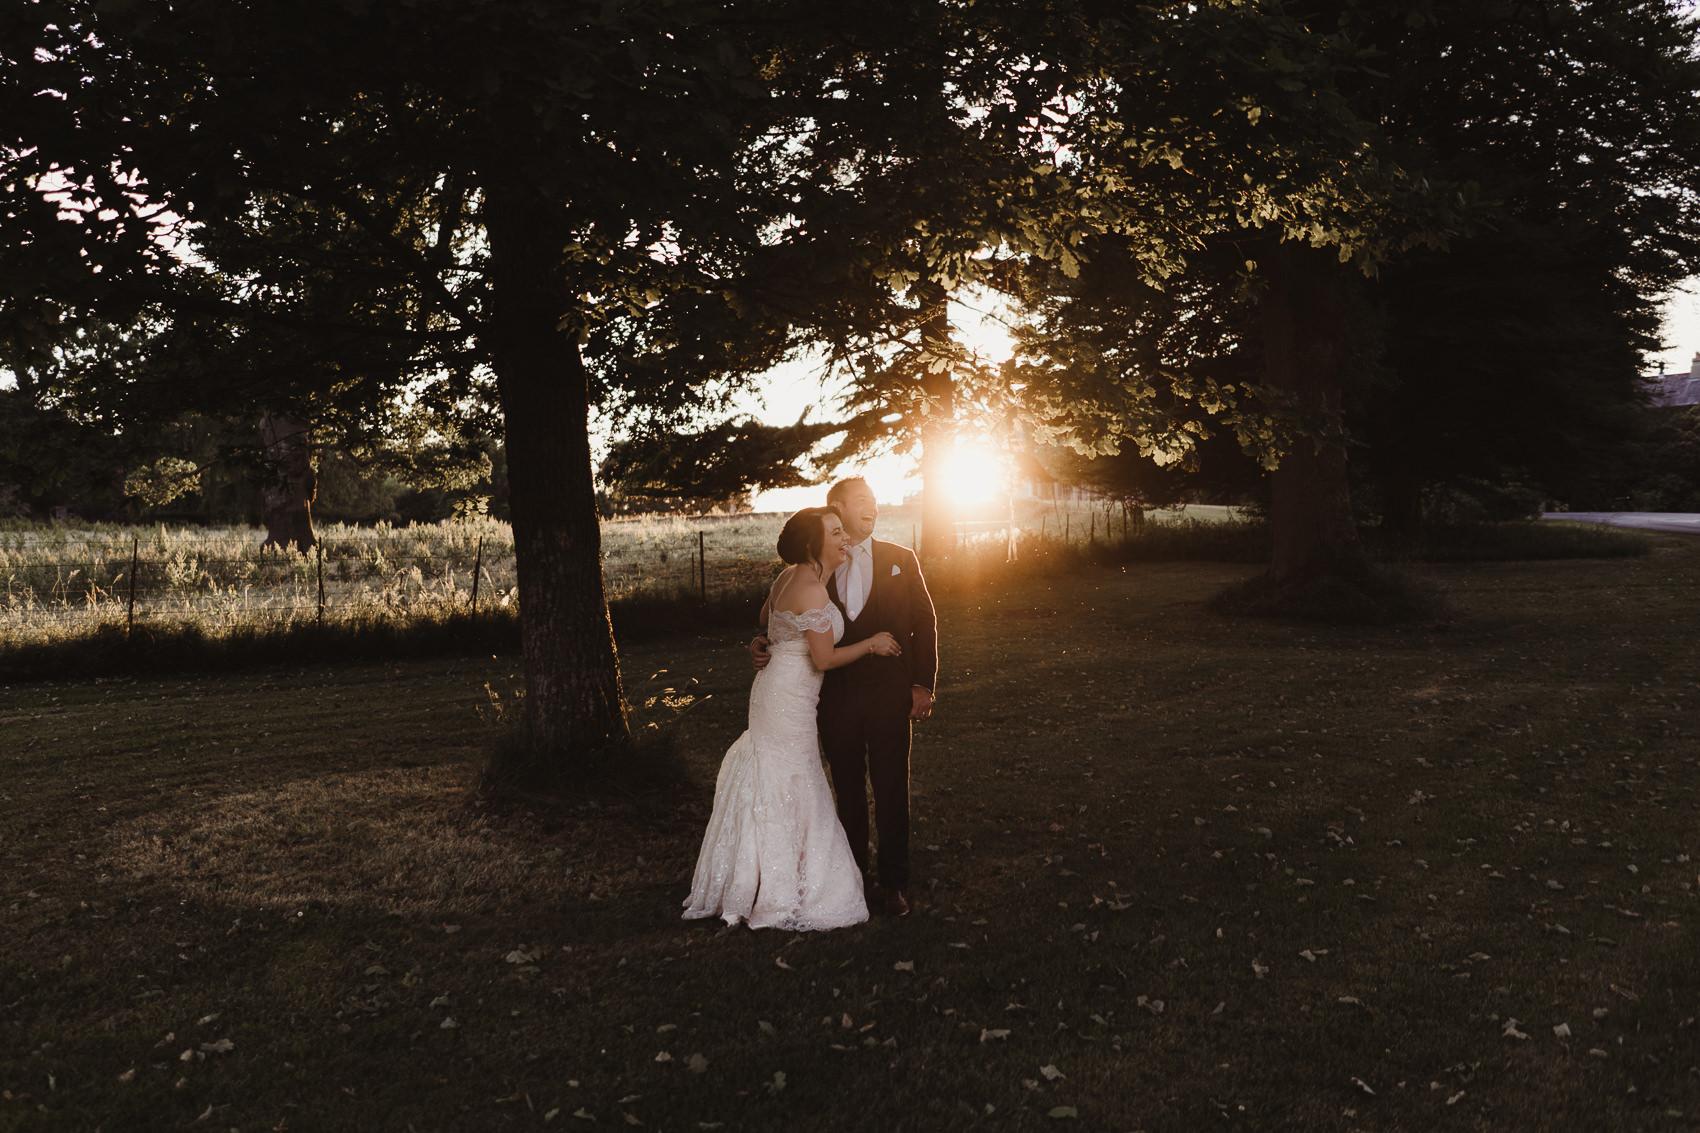 Photography by Ciara - wedding photographer 6